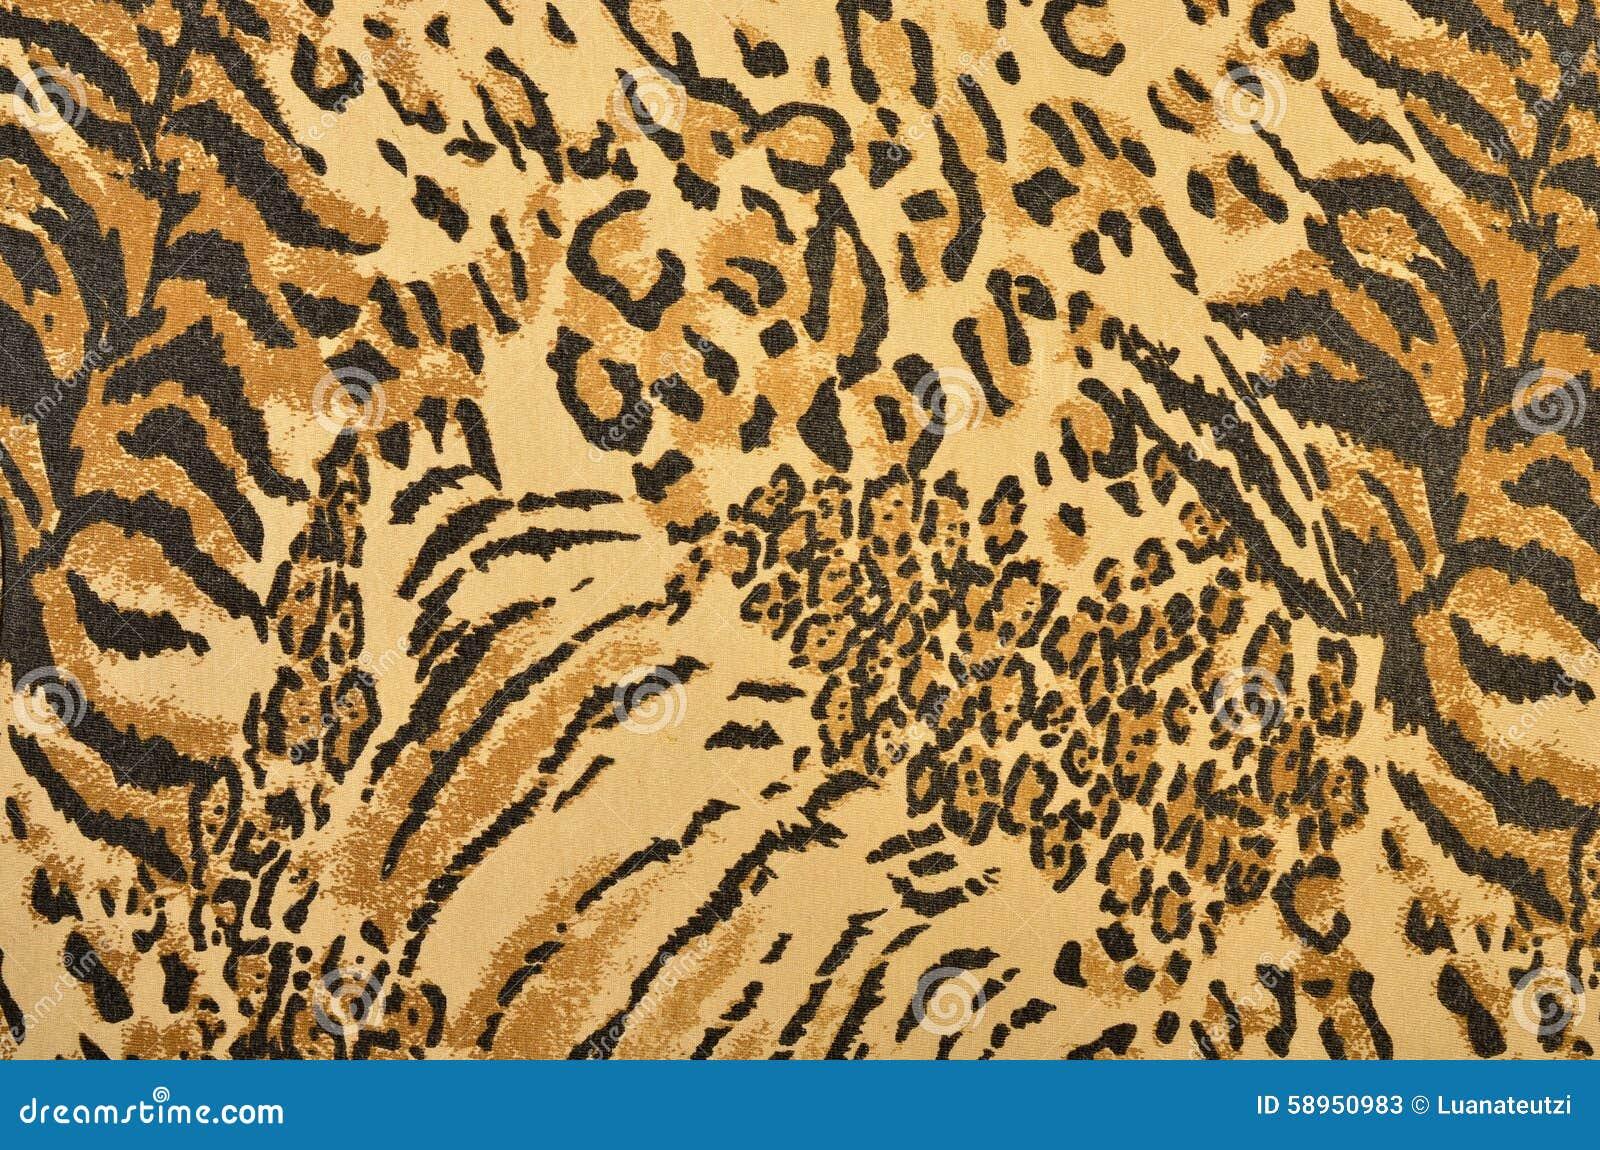 brown tiger print wallpaper - photo #21